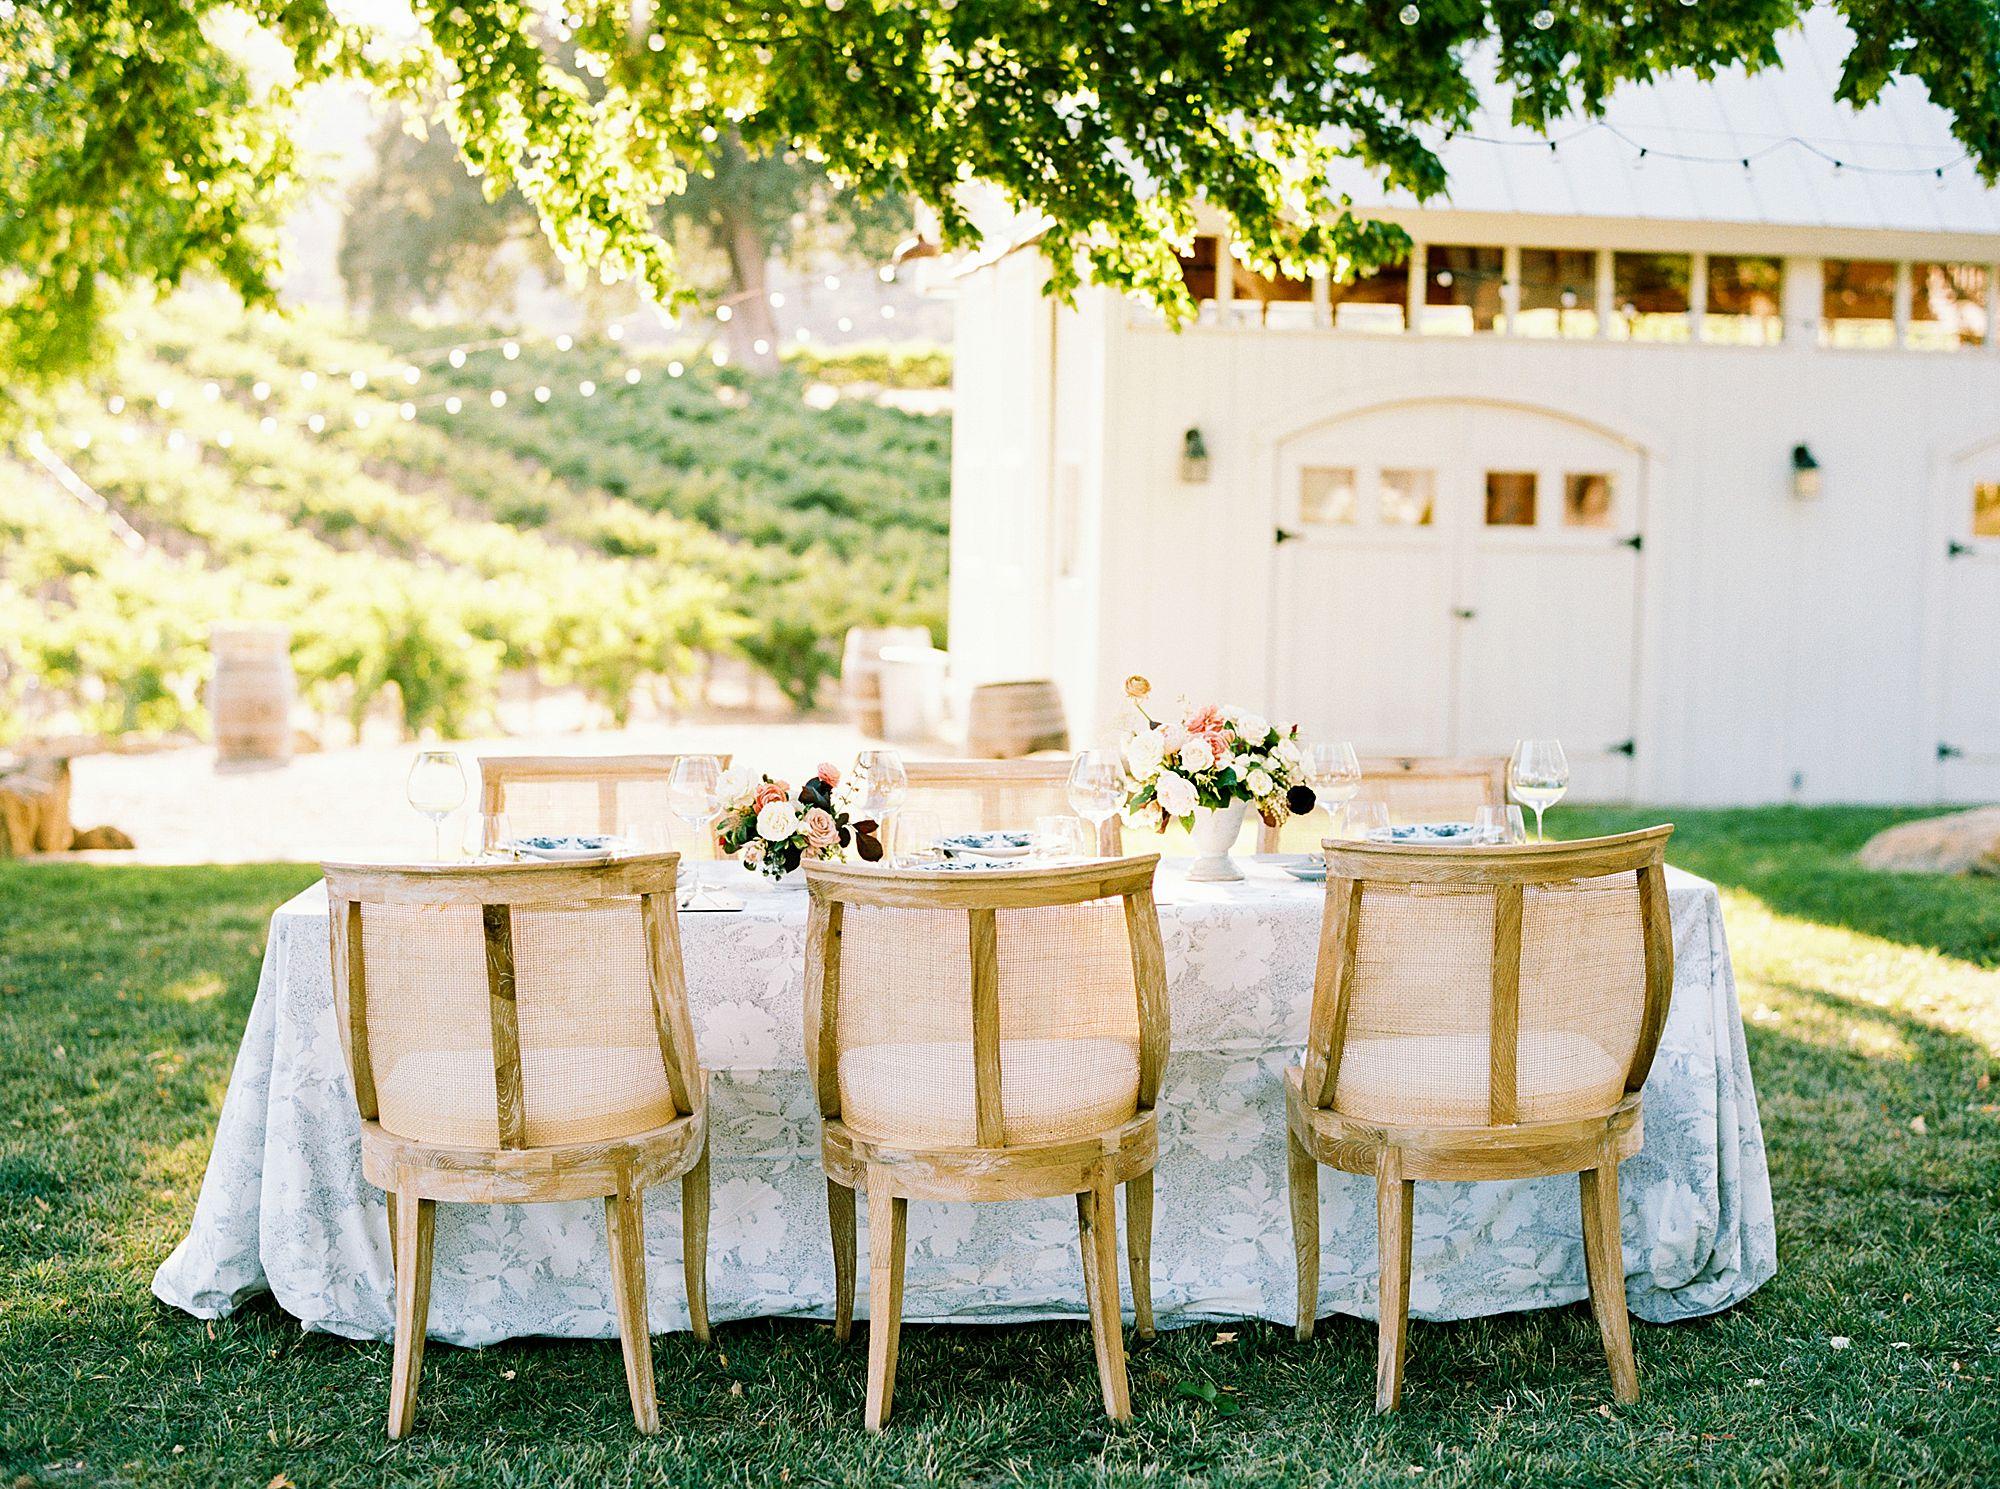 HammerSky Wedding Inspiration Featured on Hey Wedding Lady with Vanessa Noel Events - Ashley Baumgartner - SLO Wedding Photographer_0022.jpg